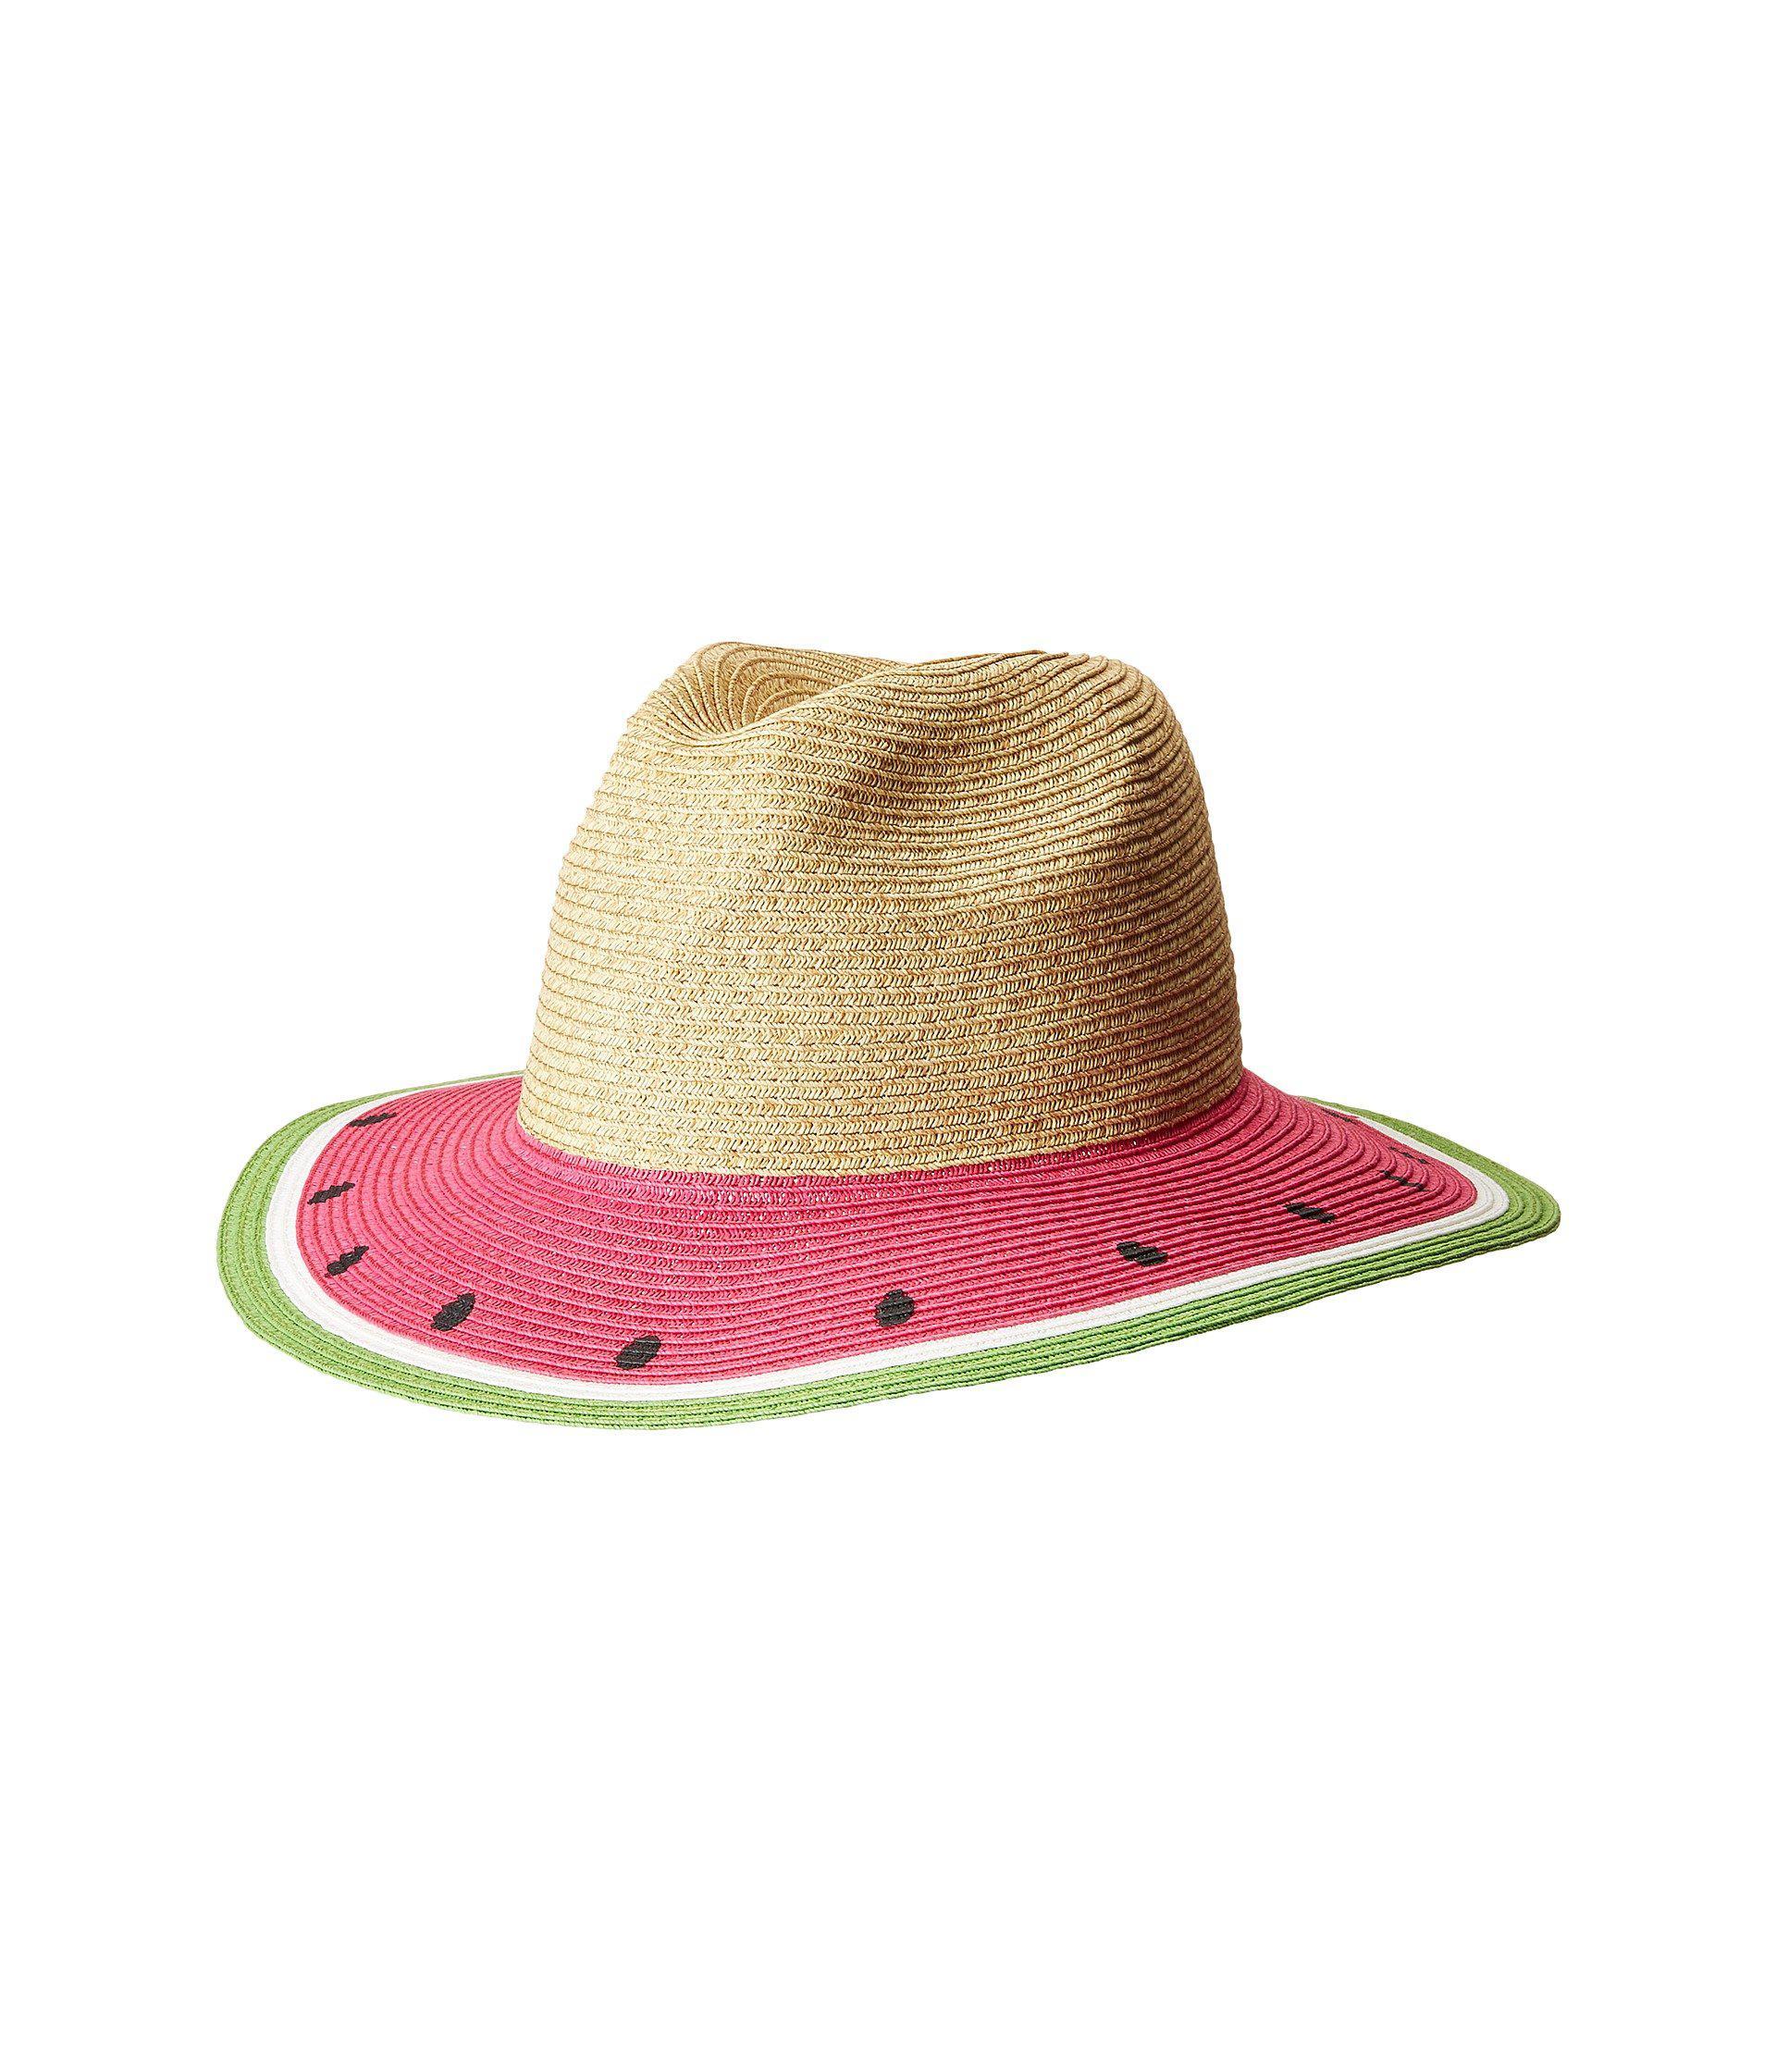 San Diego Hat Company. Women s Ubf1102 Fruit Fedora (watermelon) Fedora Hats 14d7ecc6d787